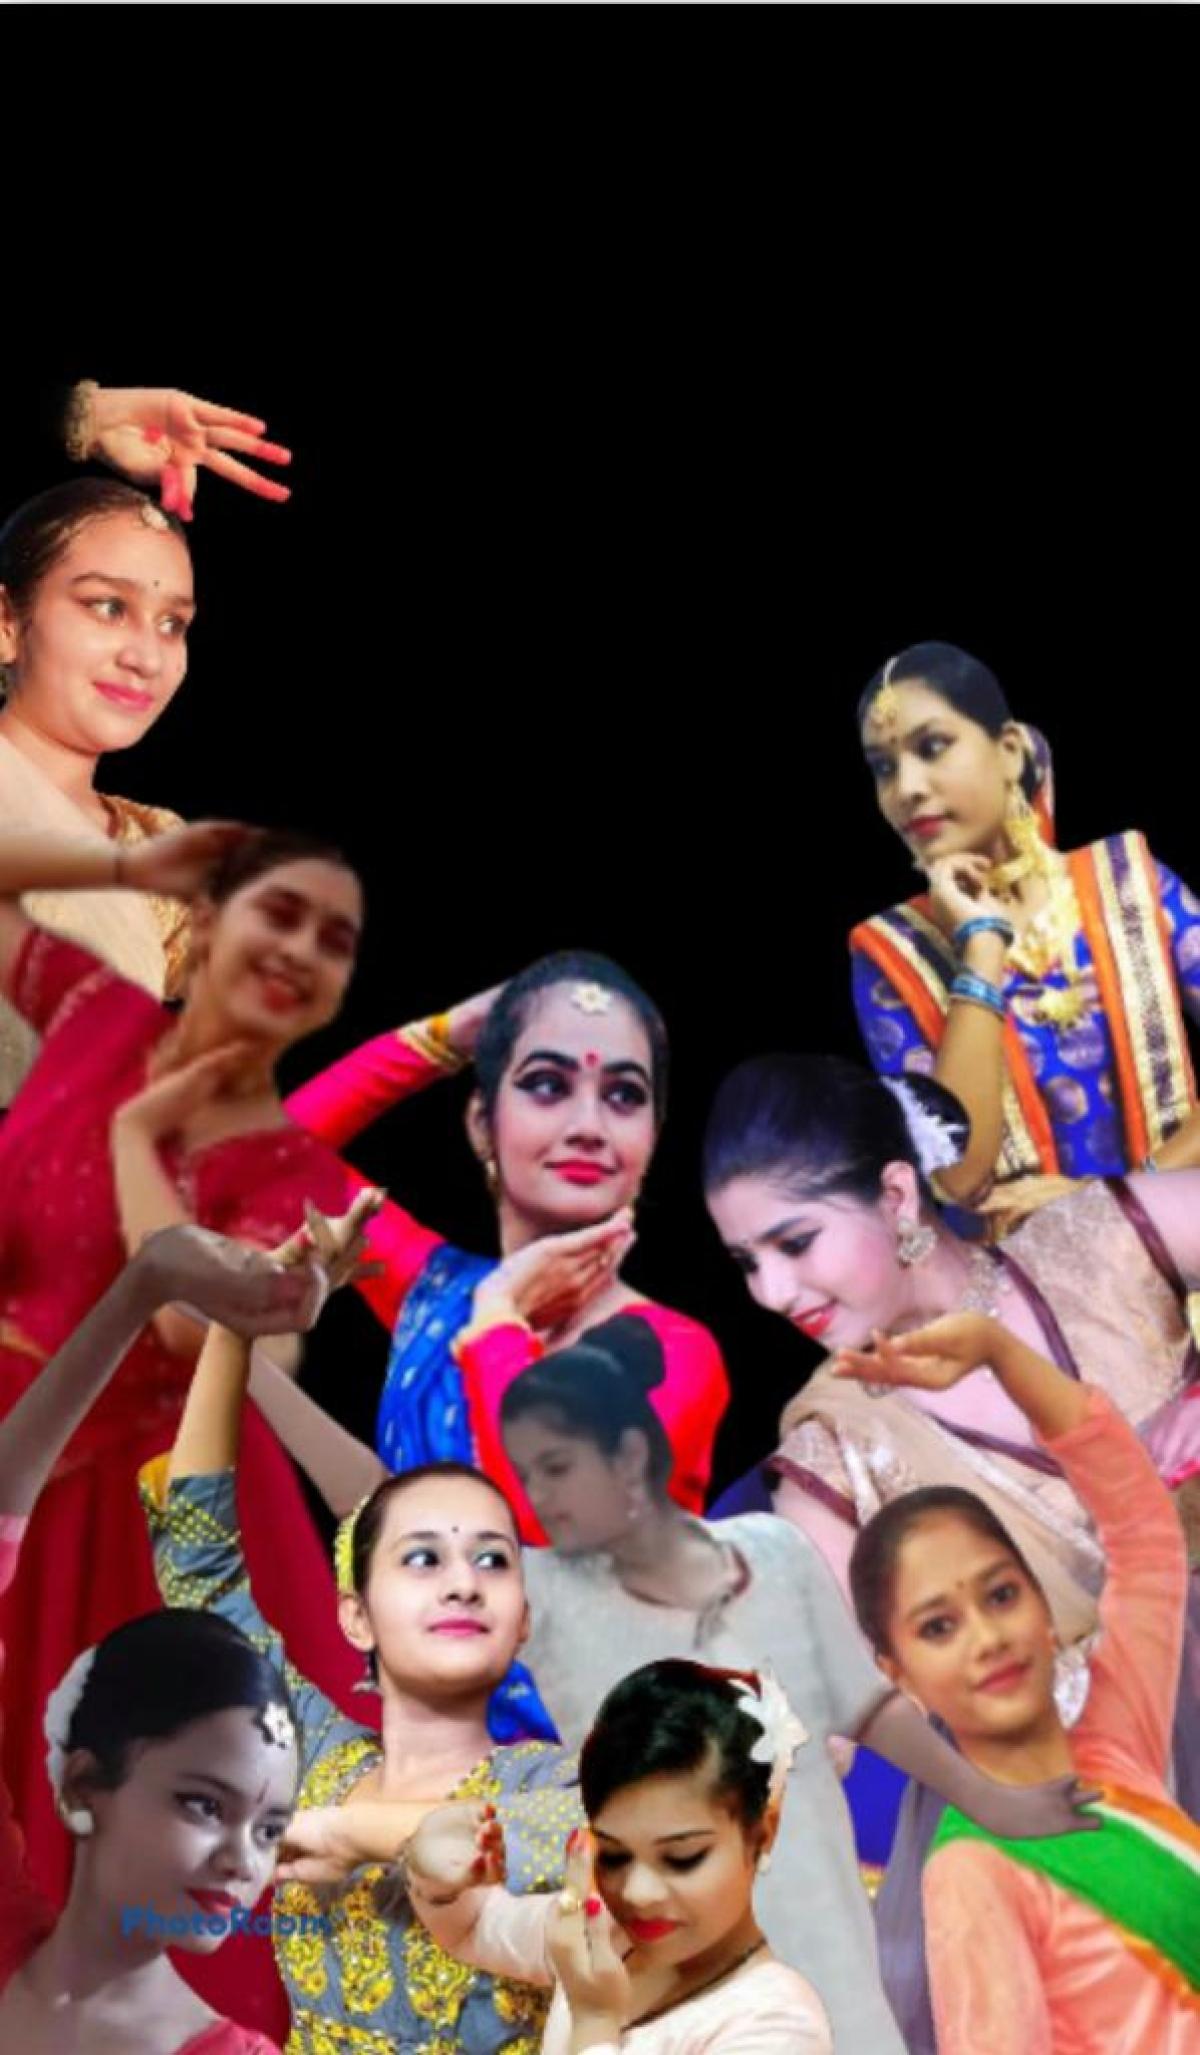 Artists of Nrityaradhana Nritya Mandir present an online dance themed on prayer to eradicate corona